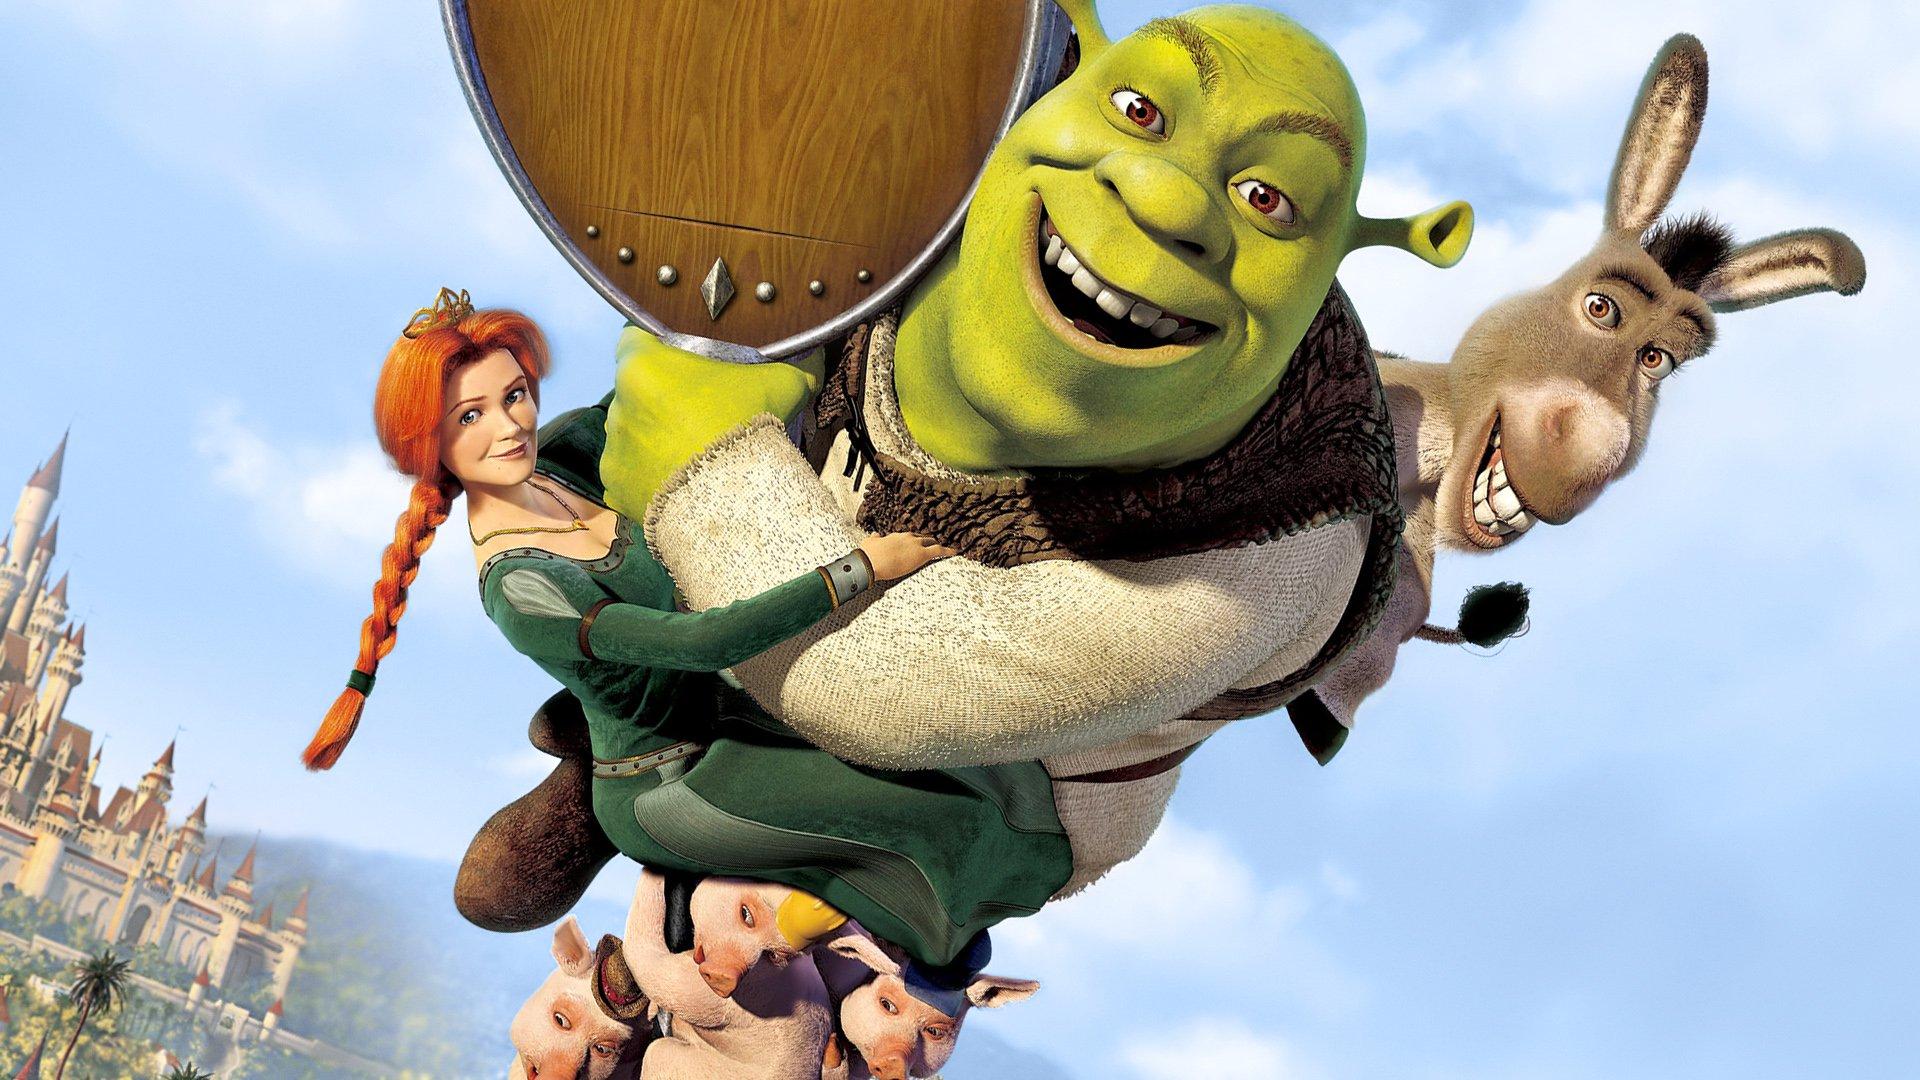 Shrek 2 Fond Décran Hd Arrière Plan 1920x1080 Id813507